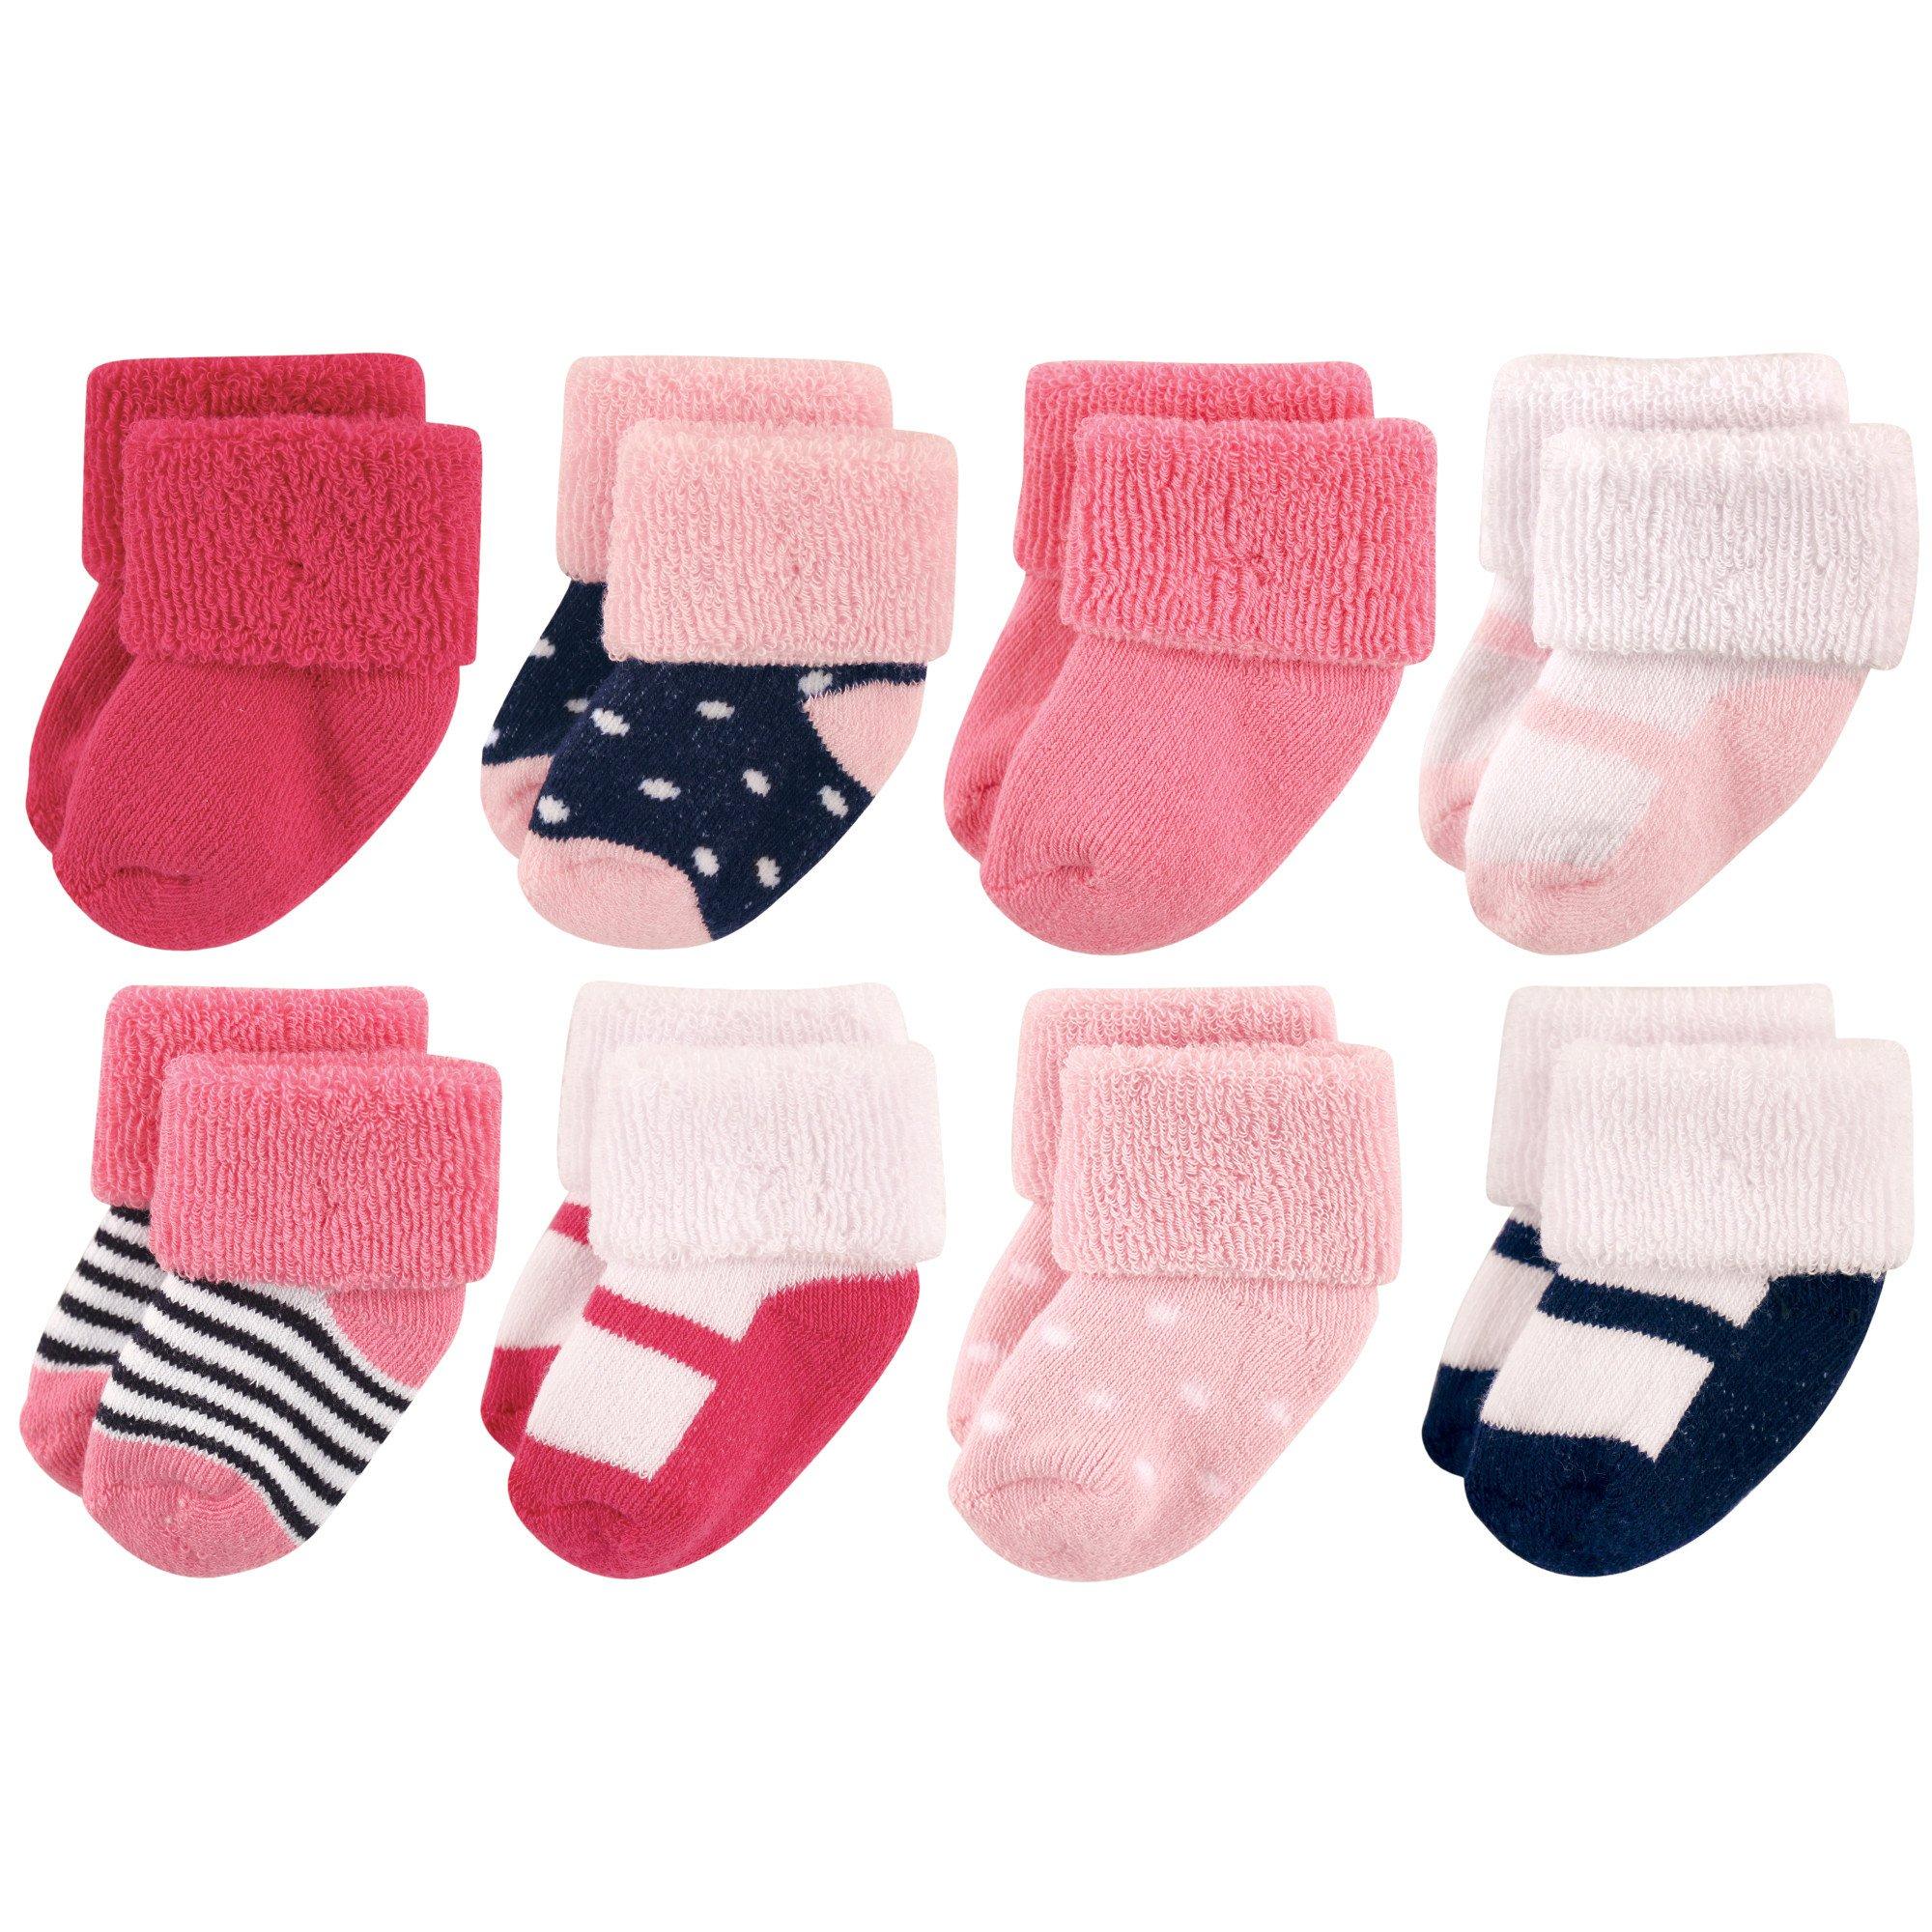 Luvable Friends Baby 8 Pack Newborn Socks, Navy